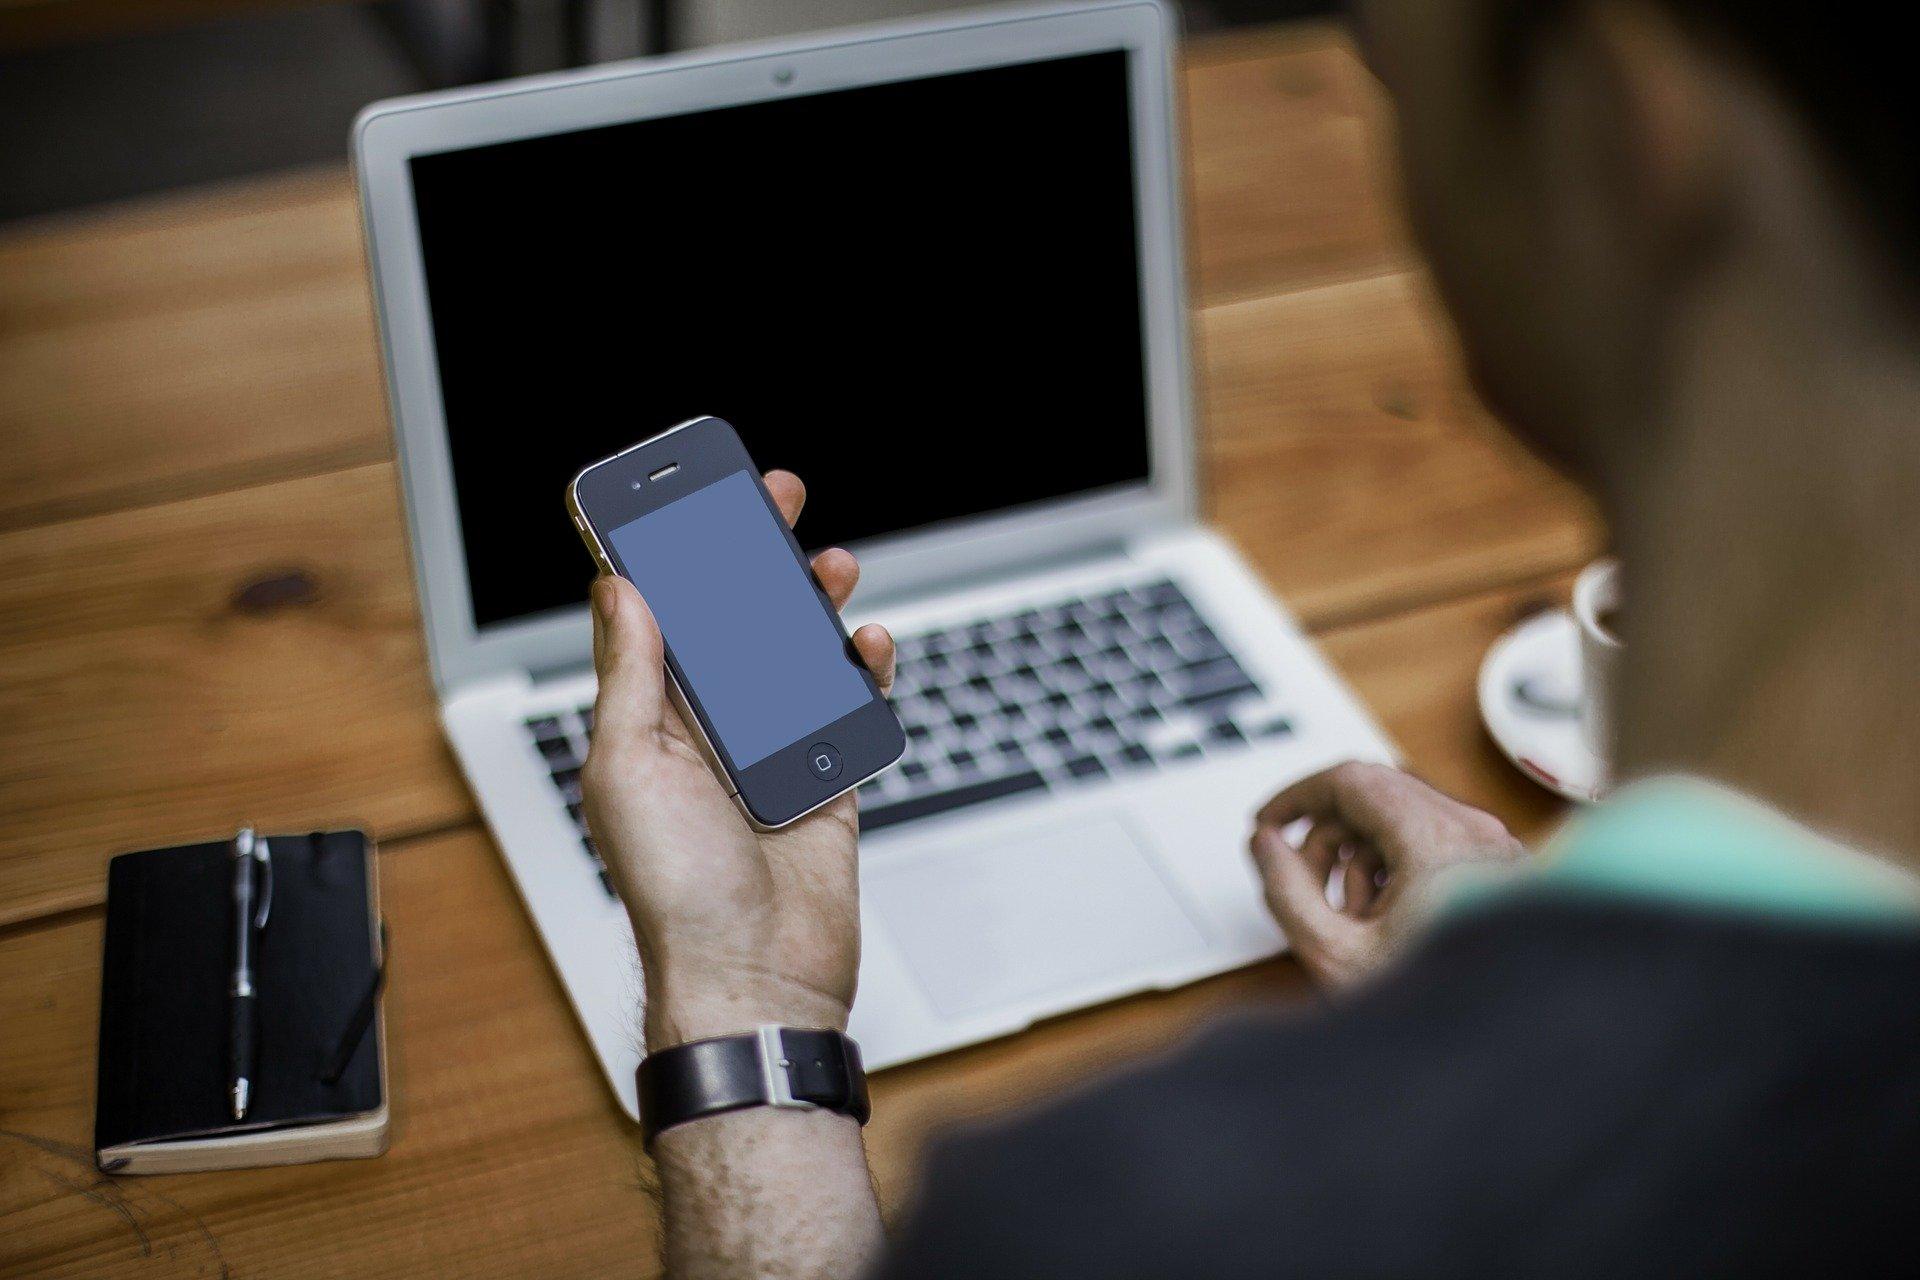 exporter SMS iPhone vers Mac/PC